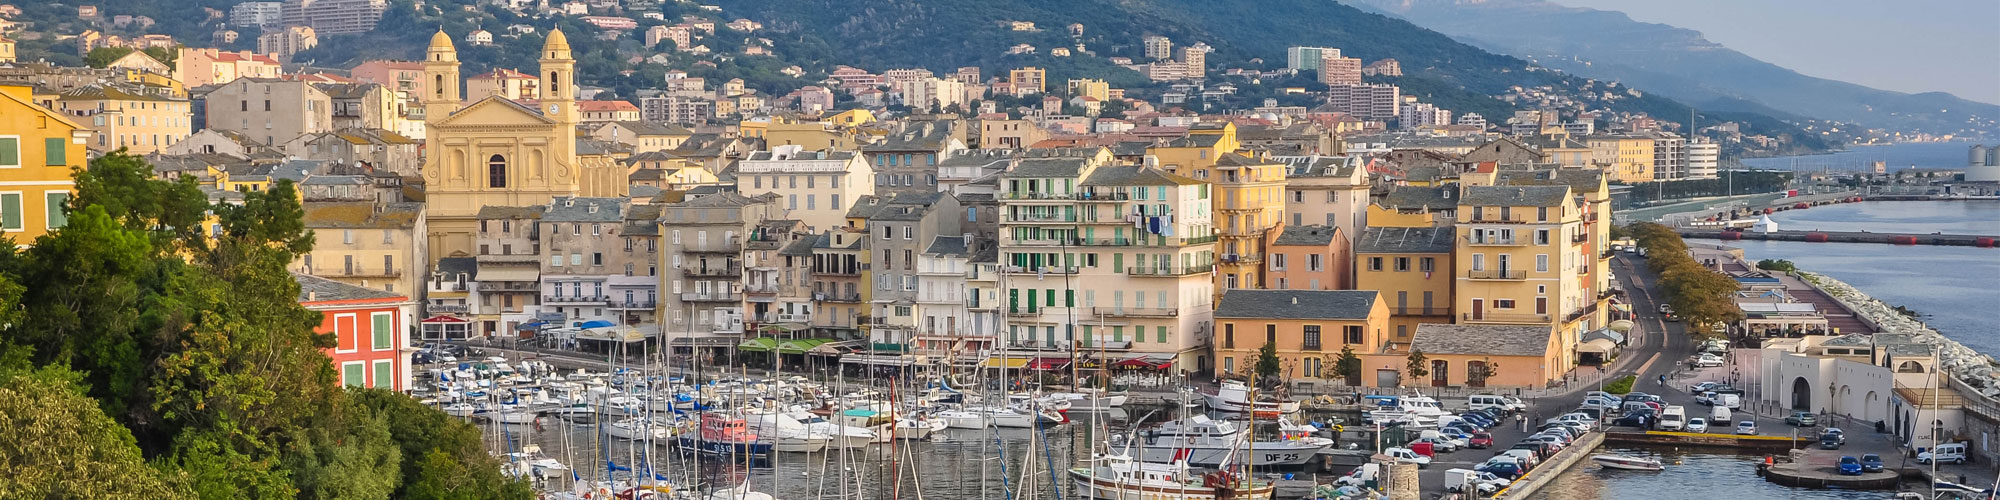 Paradisu-Korsika-06